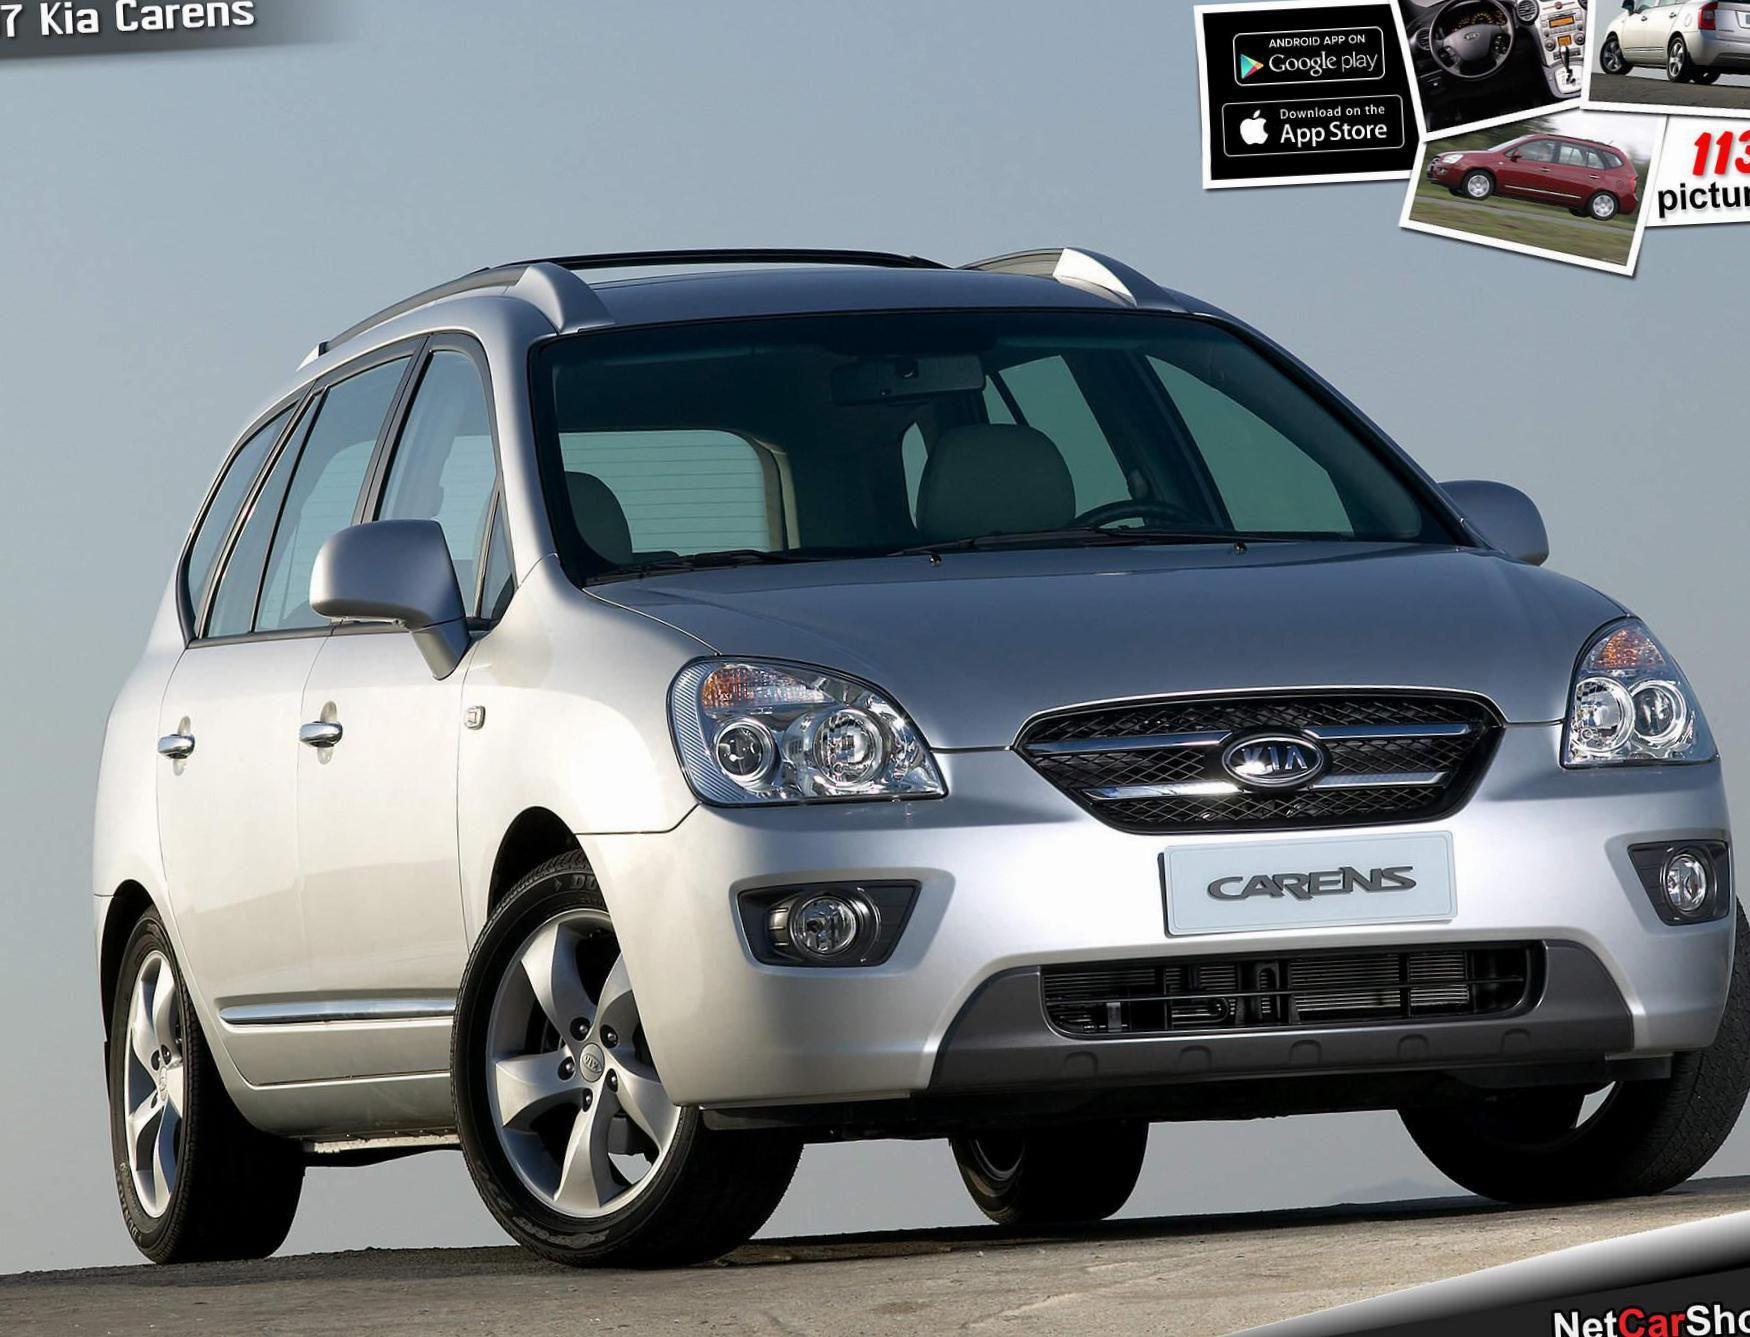 Carens KIA new Kia, Car model, Suv car